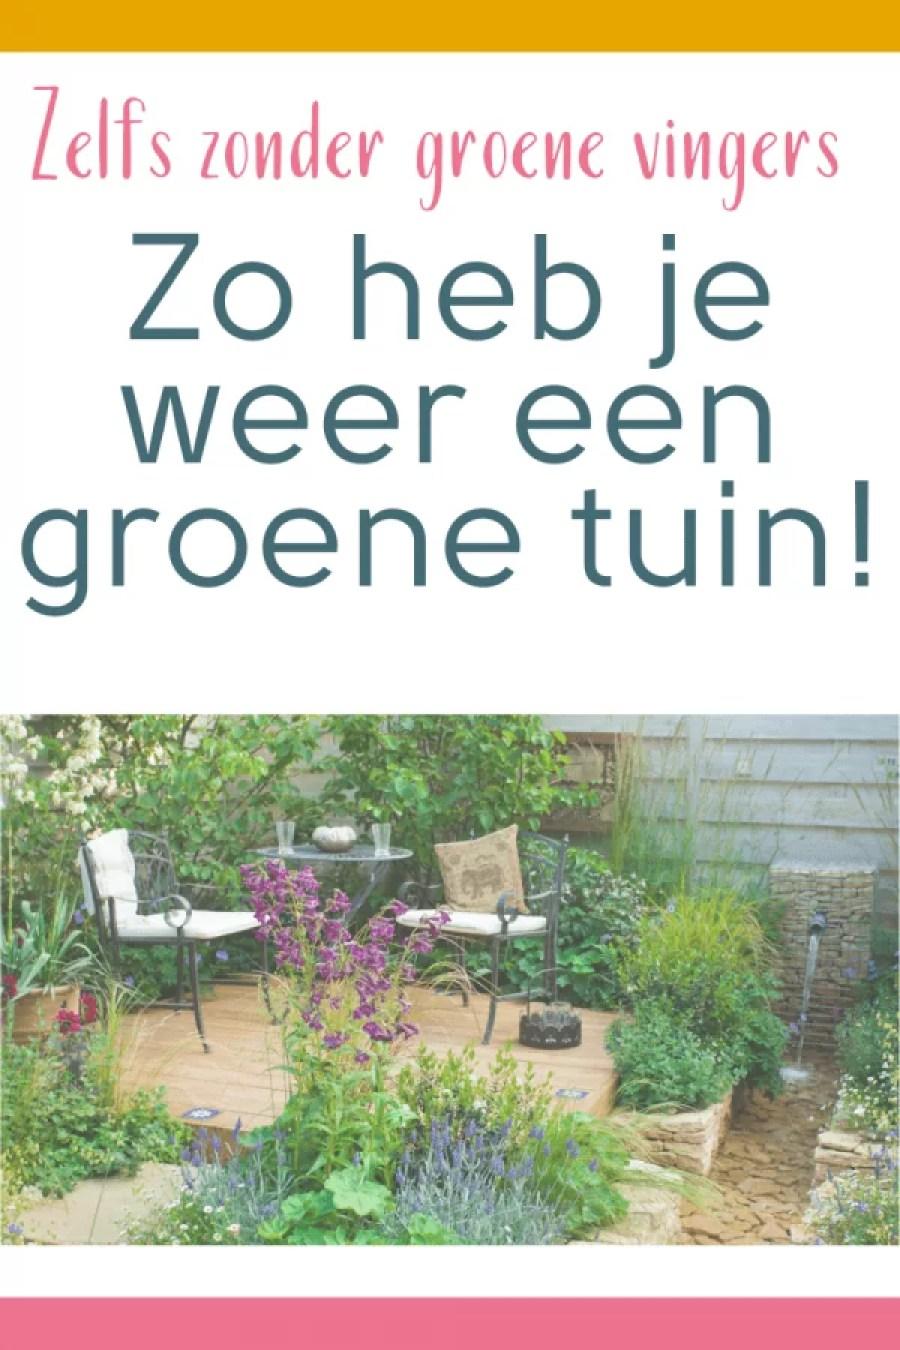 D79B2FA1 5C85 4DF2 B424 C932048786AE - Een landelijke groene tuin doe je zo!